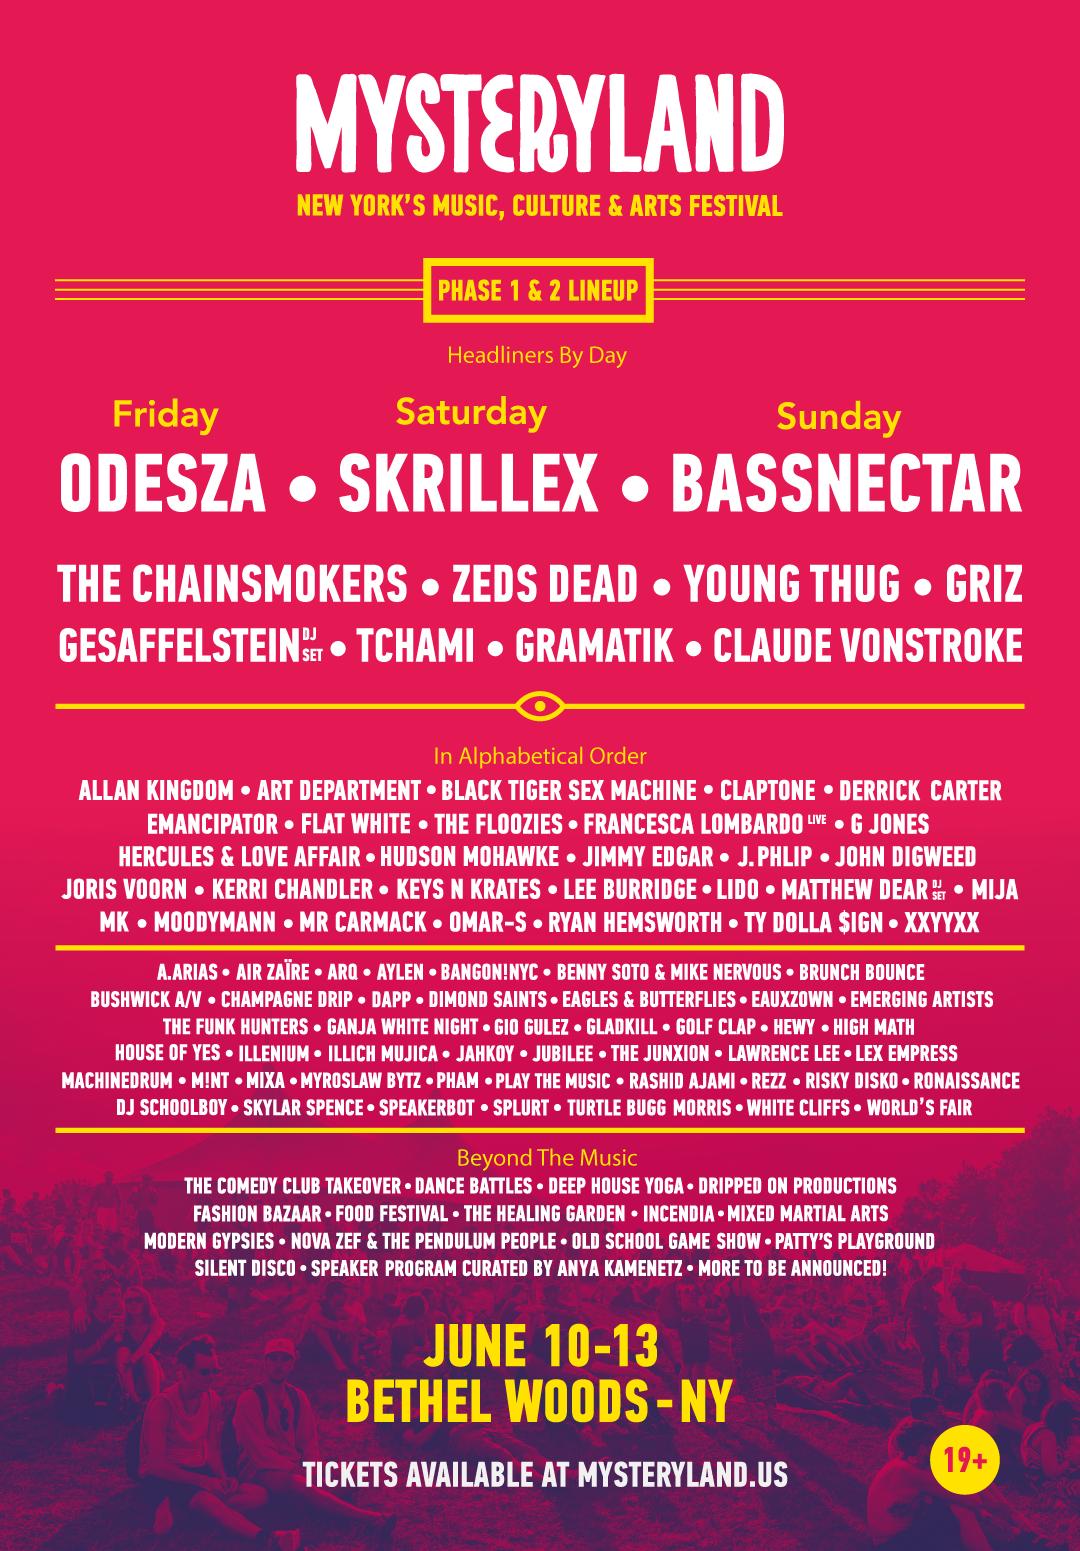 Take my tuition money music festivals pinterest